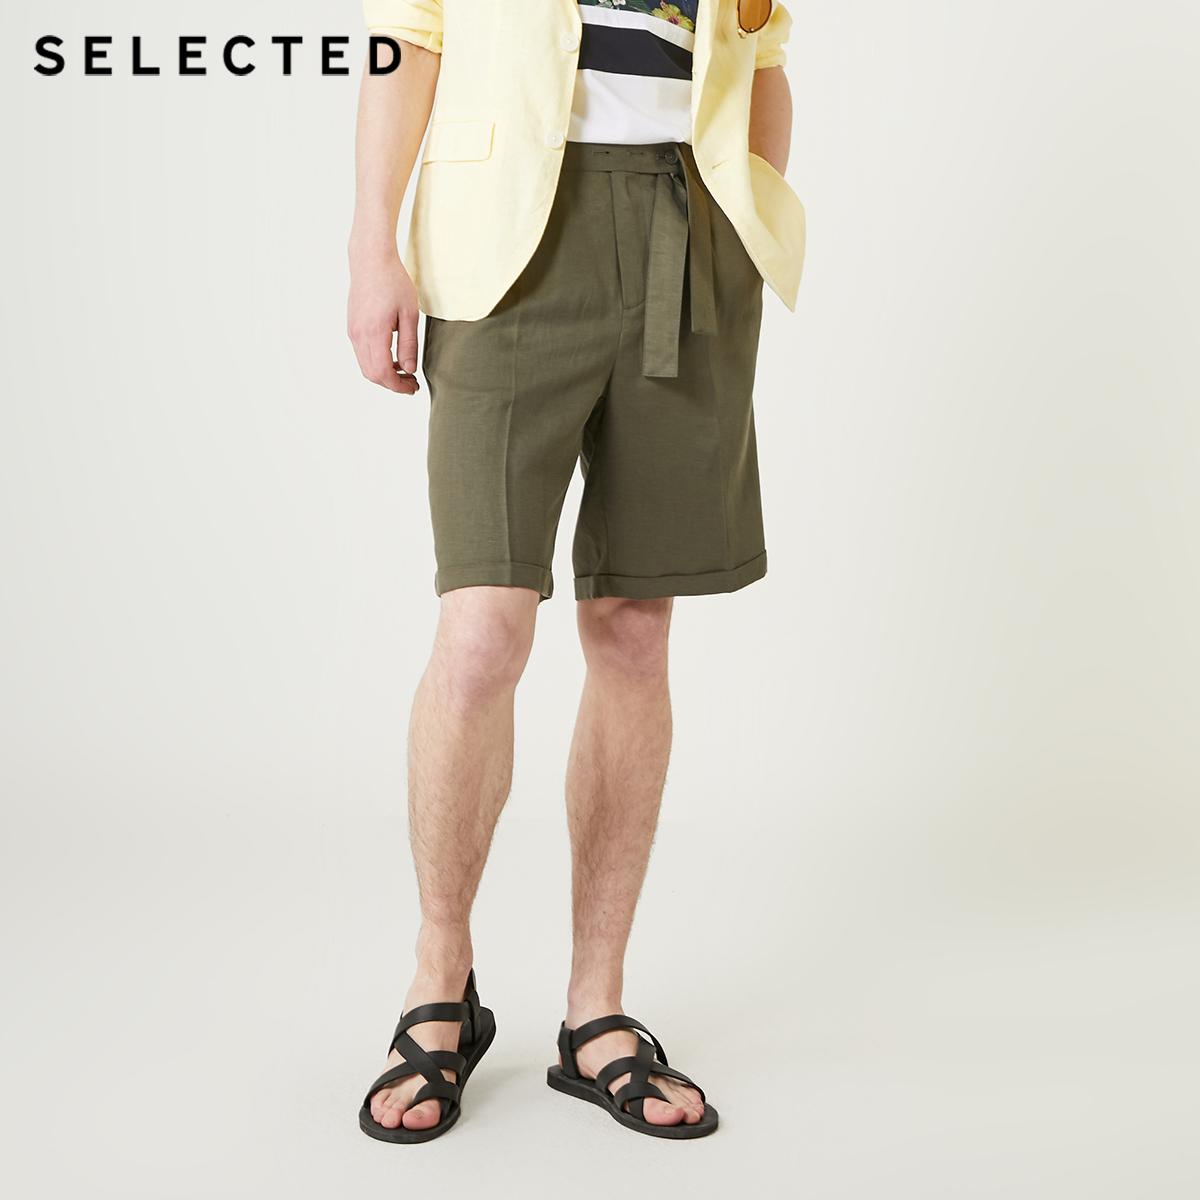 SELECTED Men's Summer Loose Fit Tencel Linen Casual Shorts S 4192SH548